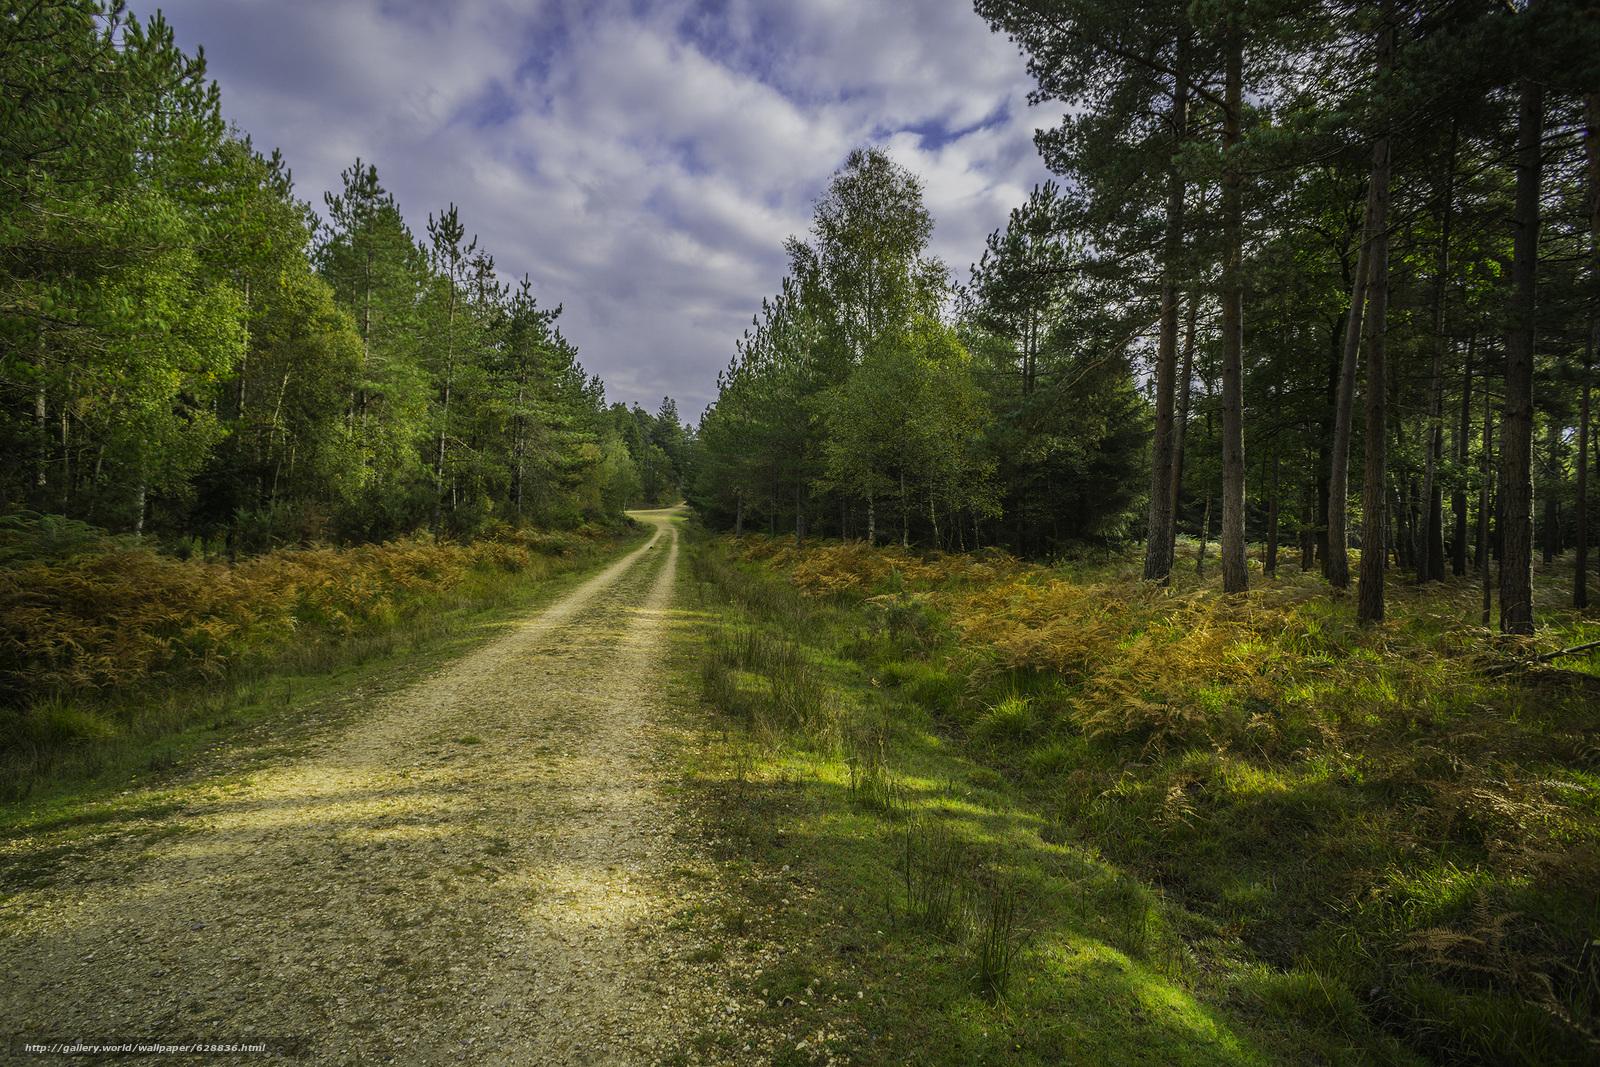 осень, лес, дорога, деревья, пейзаж